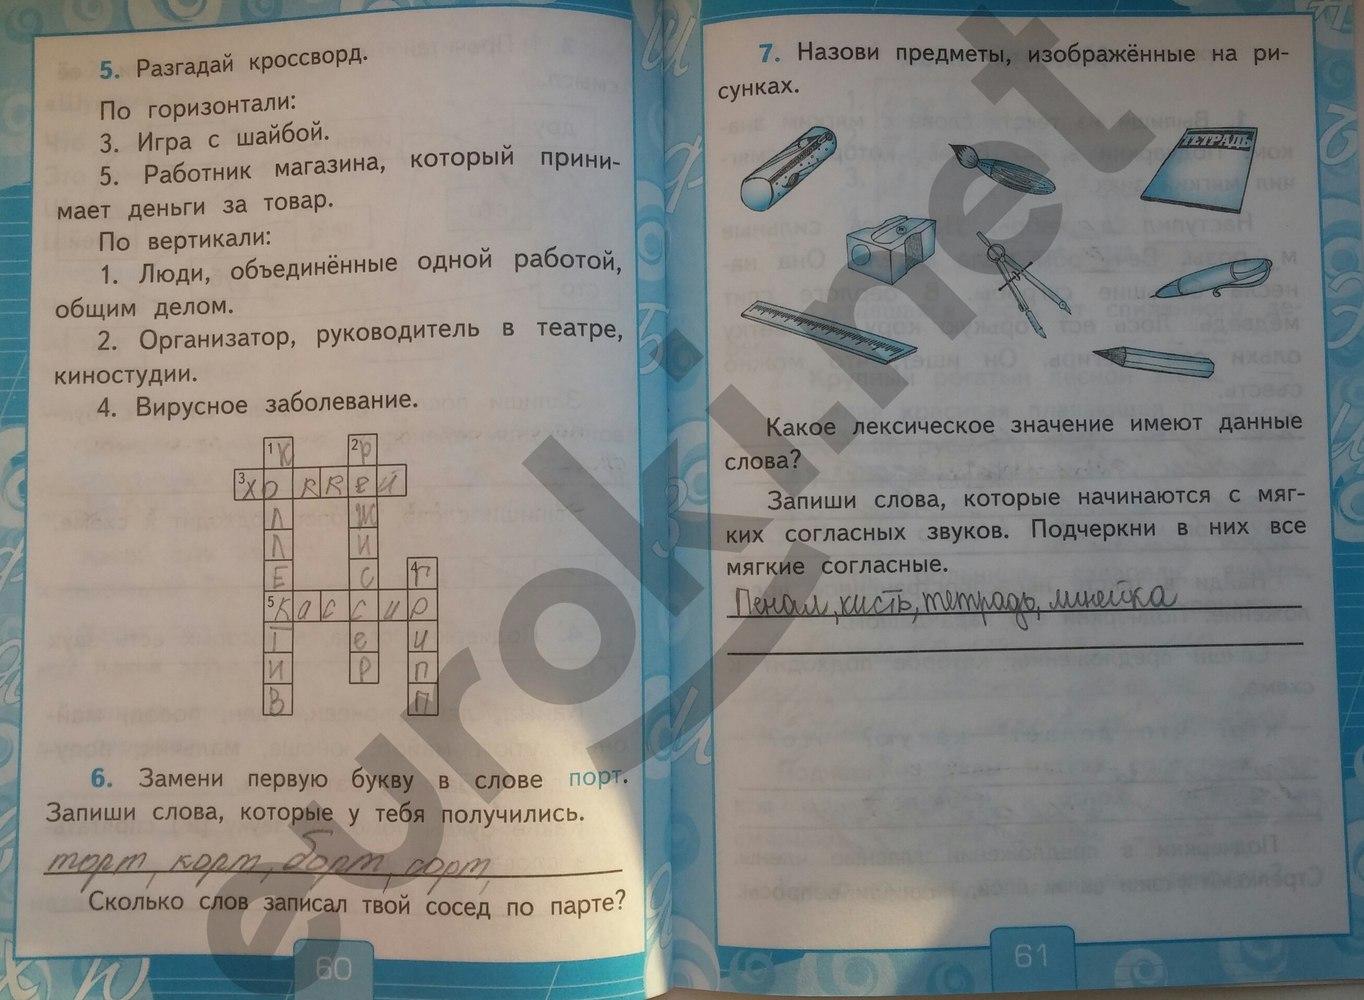 Гдз По Русскому 2 Класс Рабочая Тетрадь 1